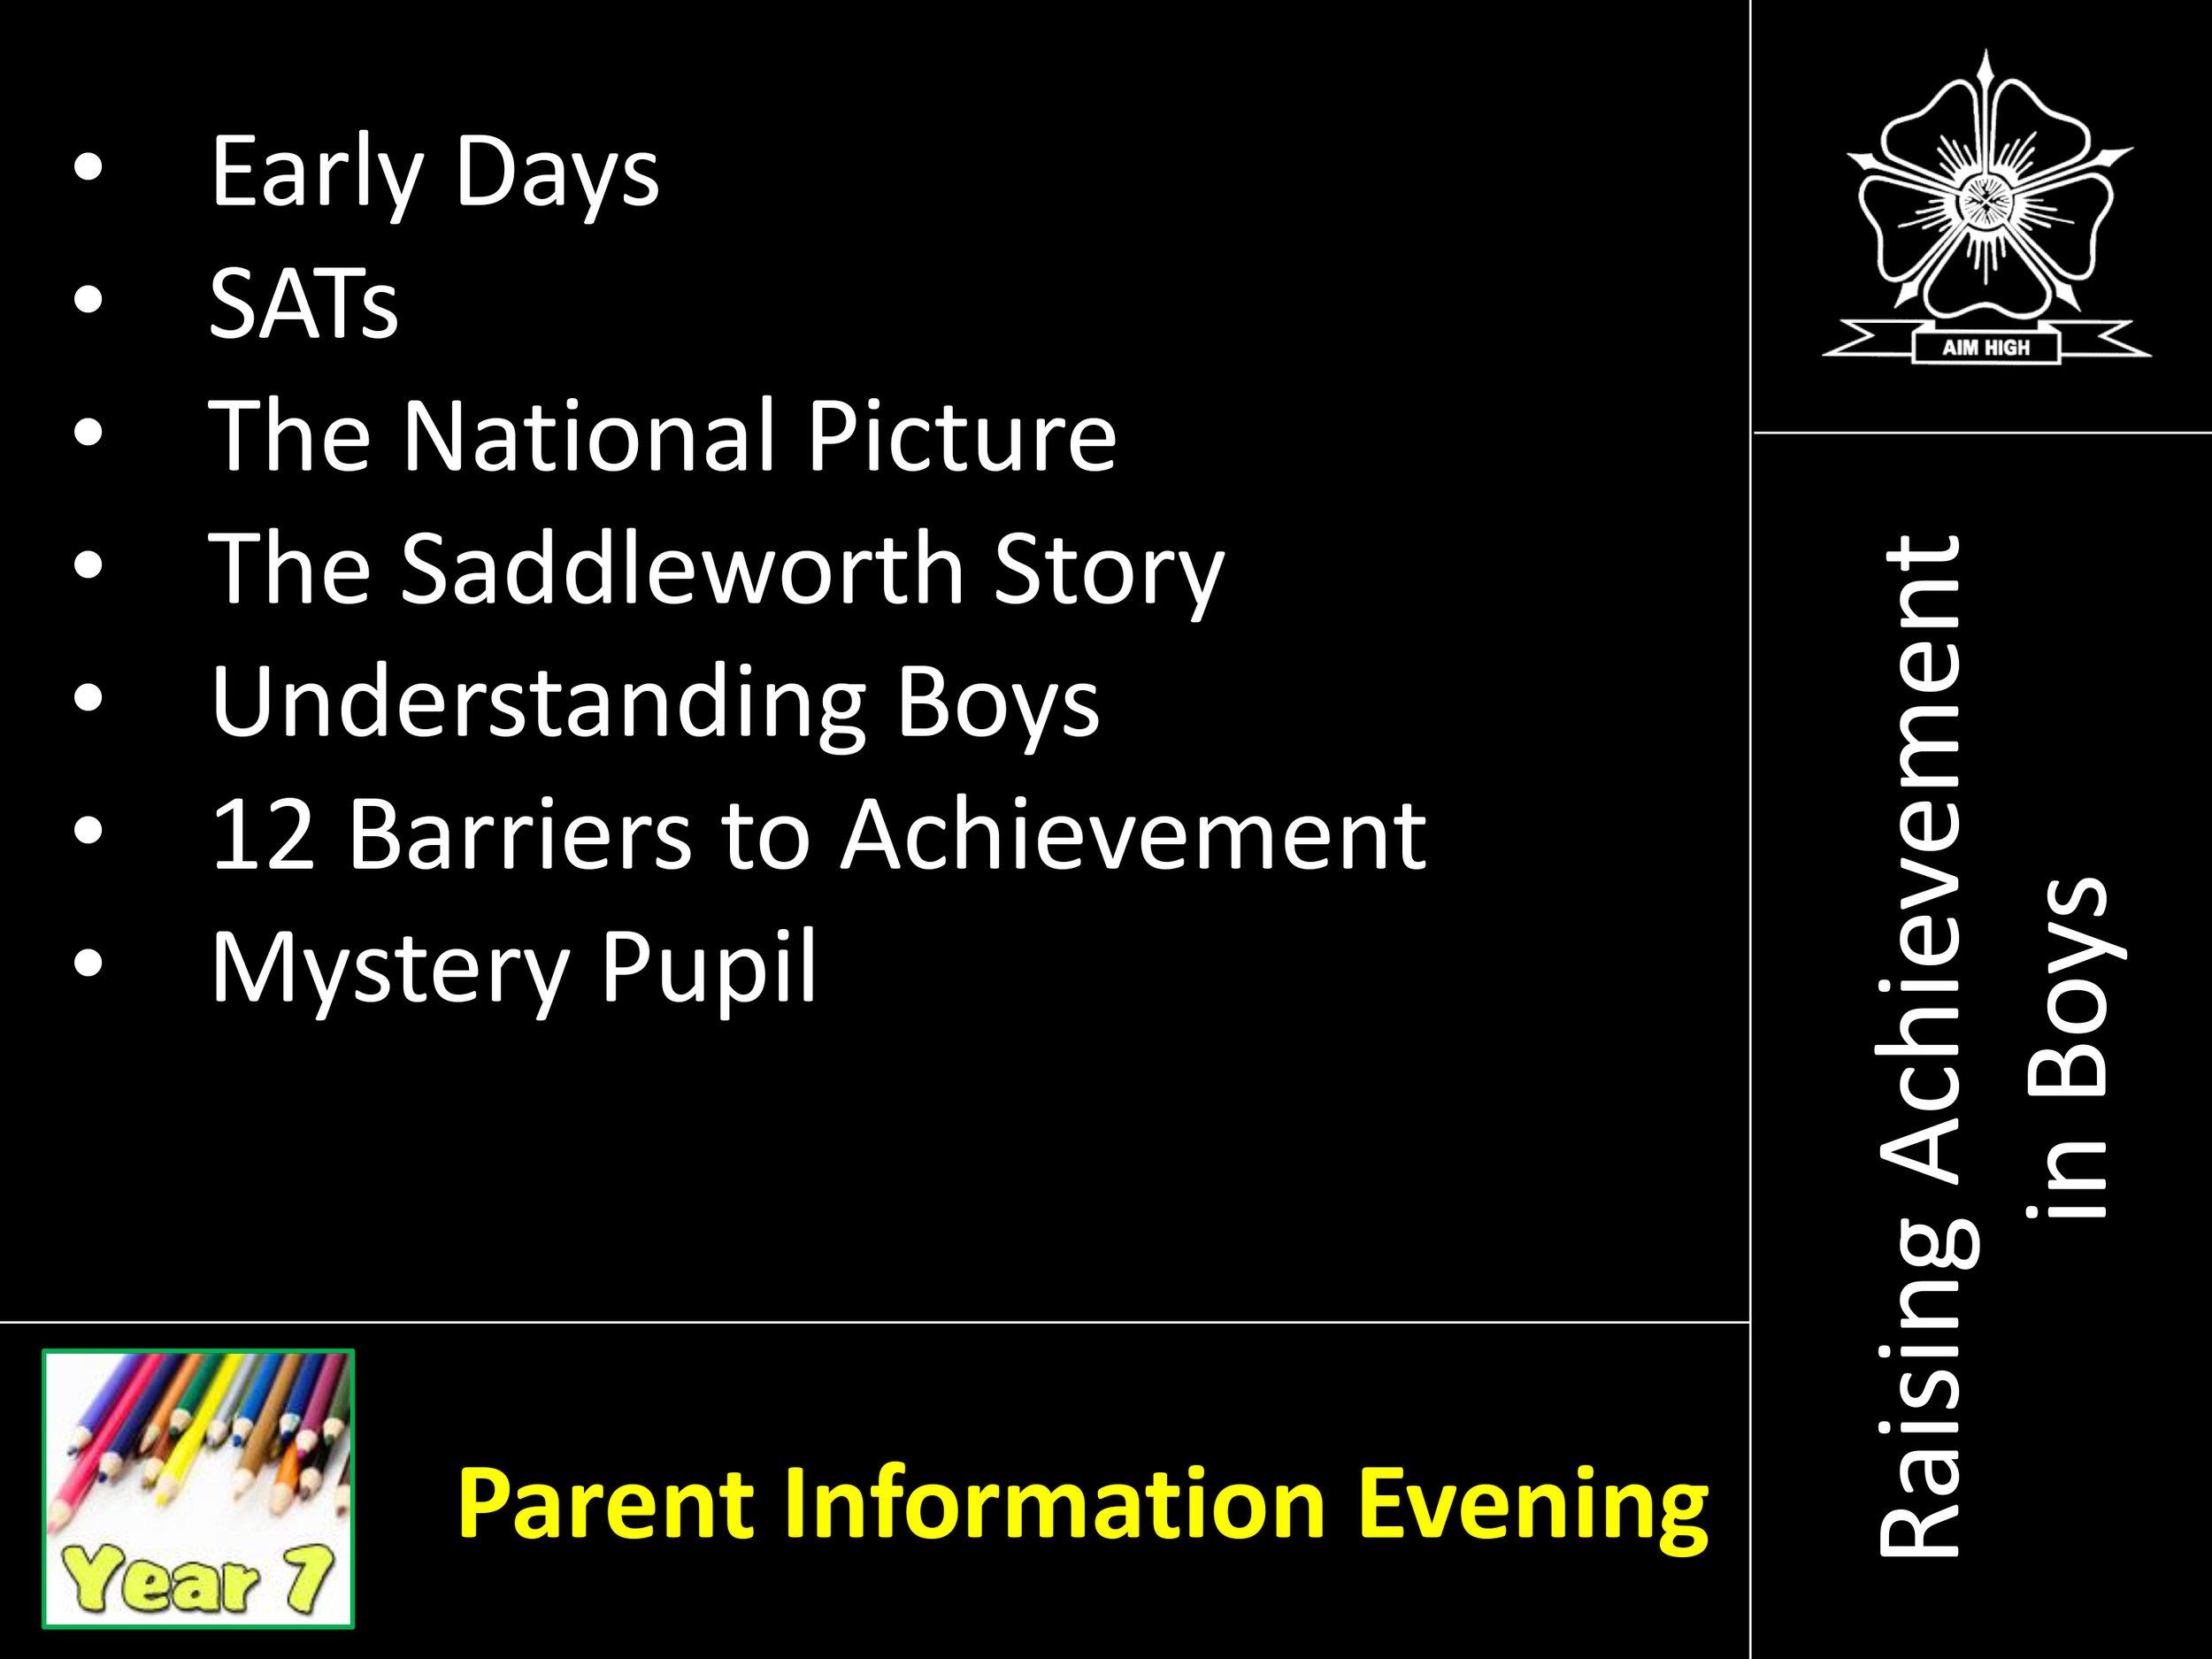 Presentation_Parents_Without_Movie-3.jpg